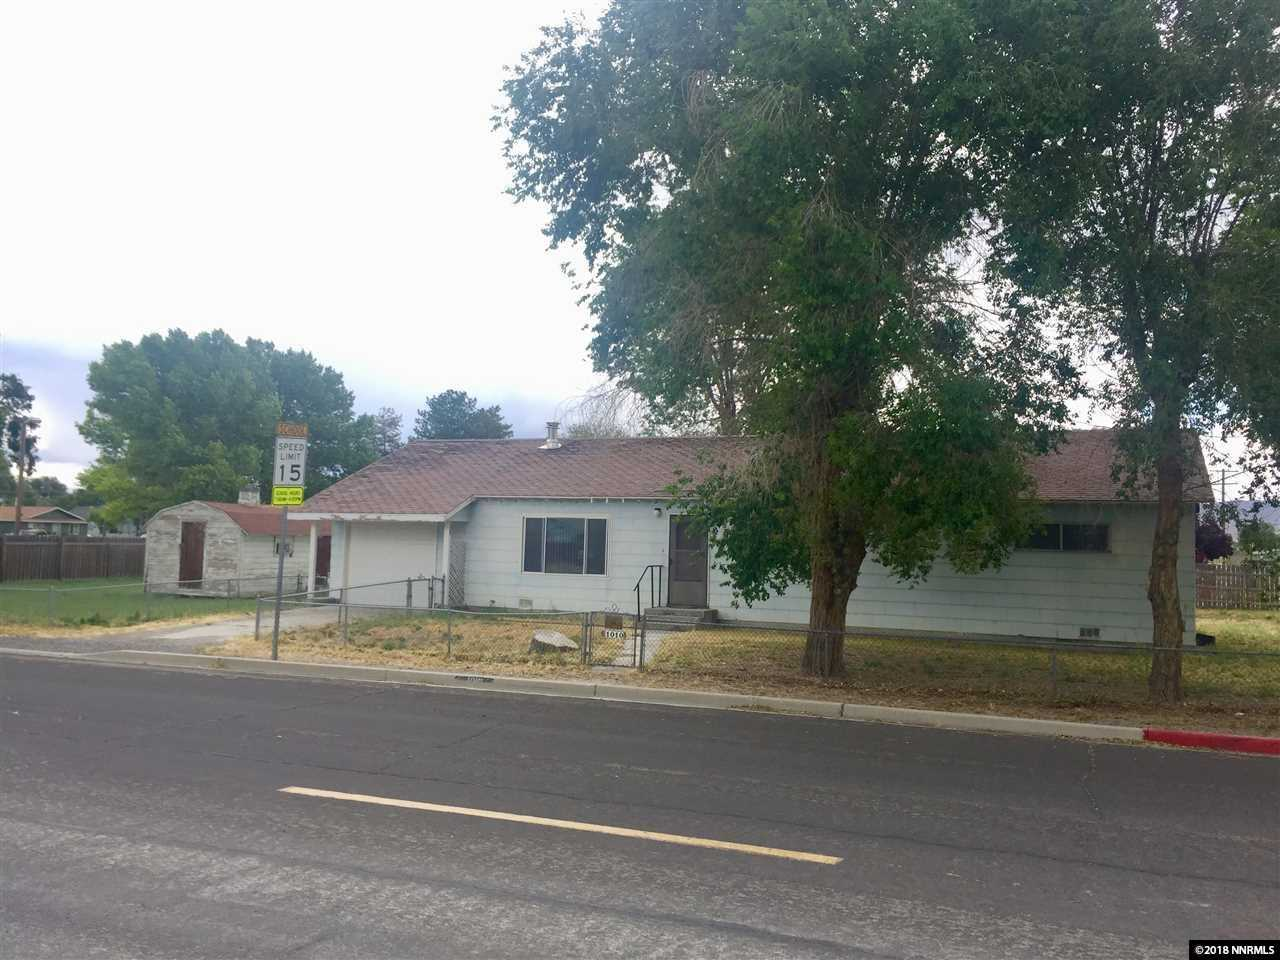 1010 Grinnel Lovelock, NV 89419 | MLS 180008530 Photo 1